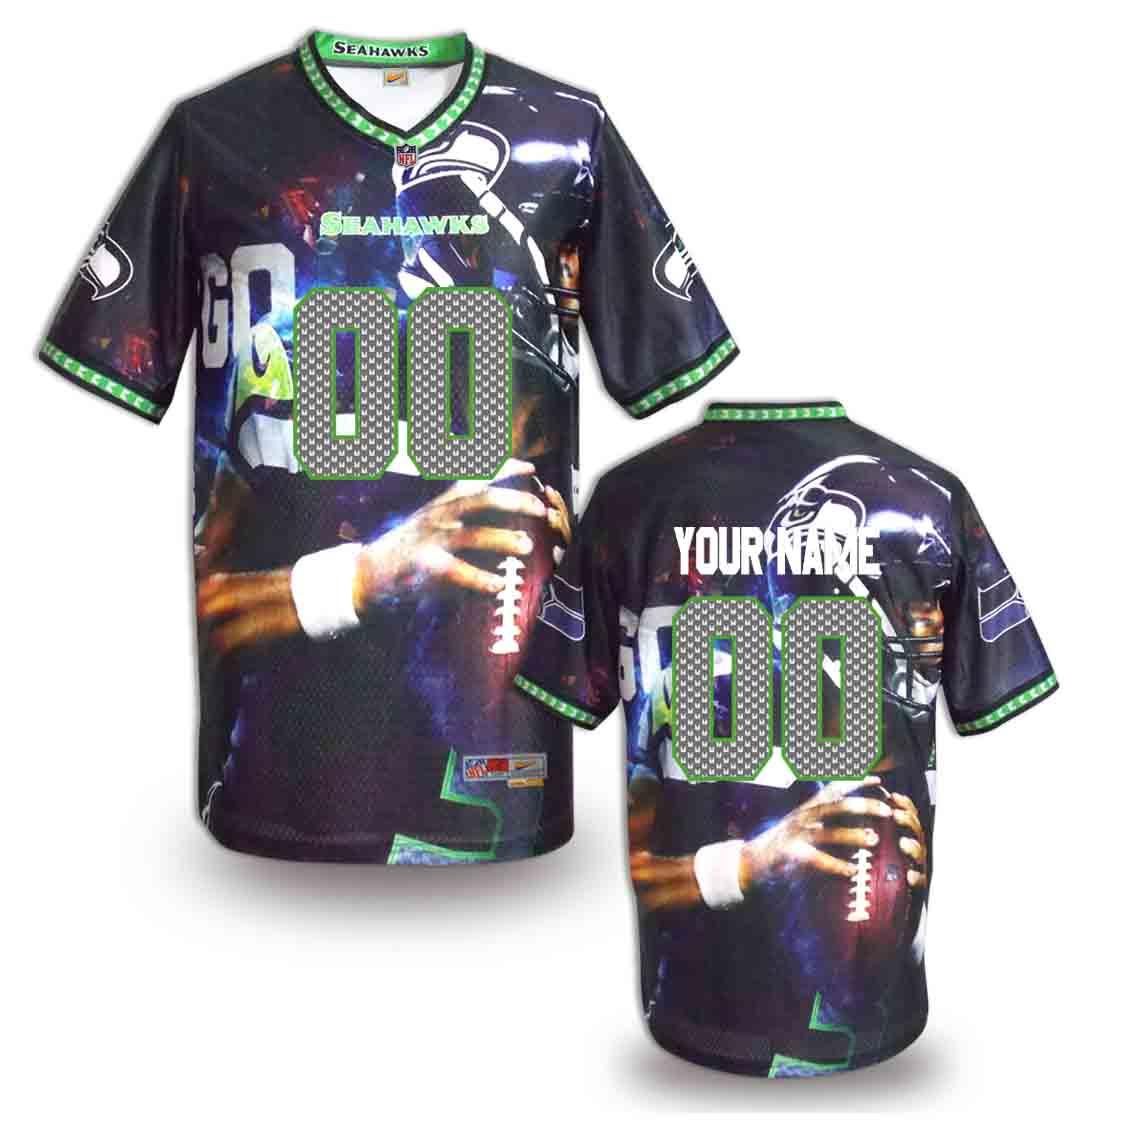 Nike Seahawks Customized Fashion Stitched Jerseys10